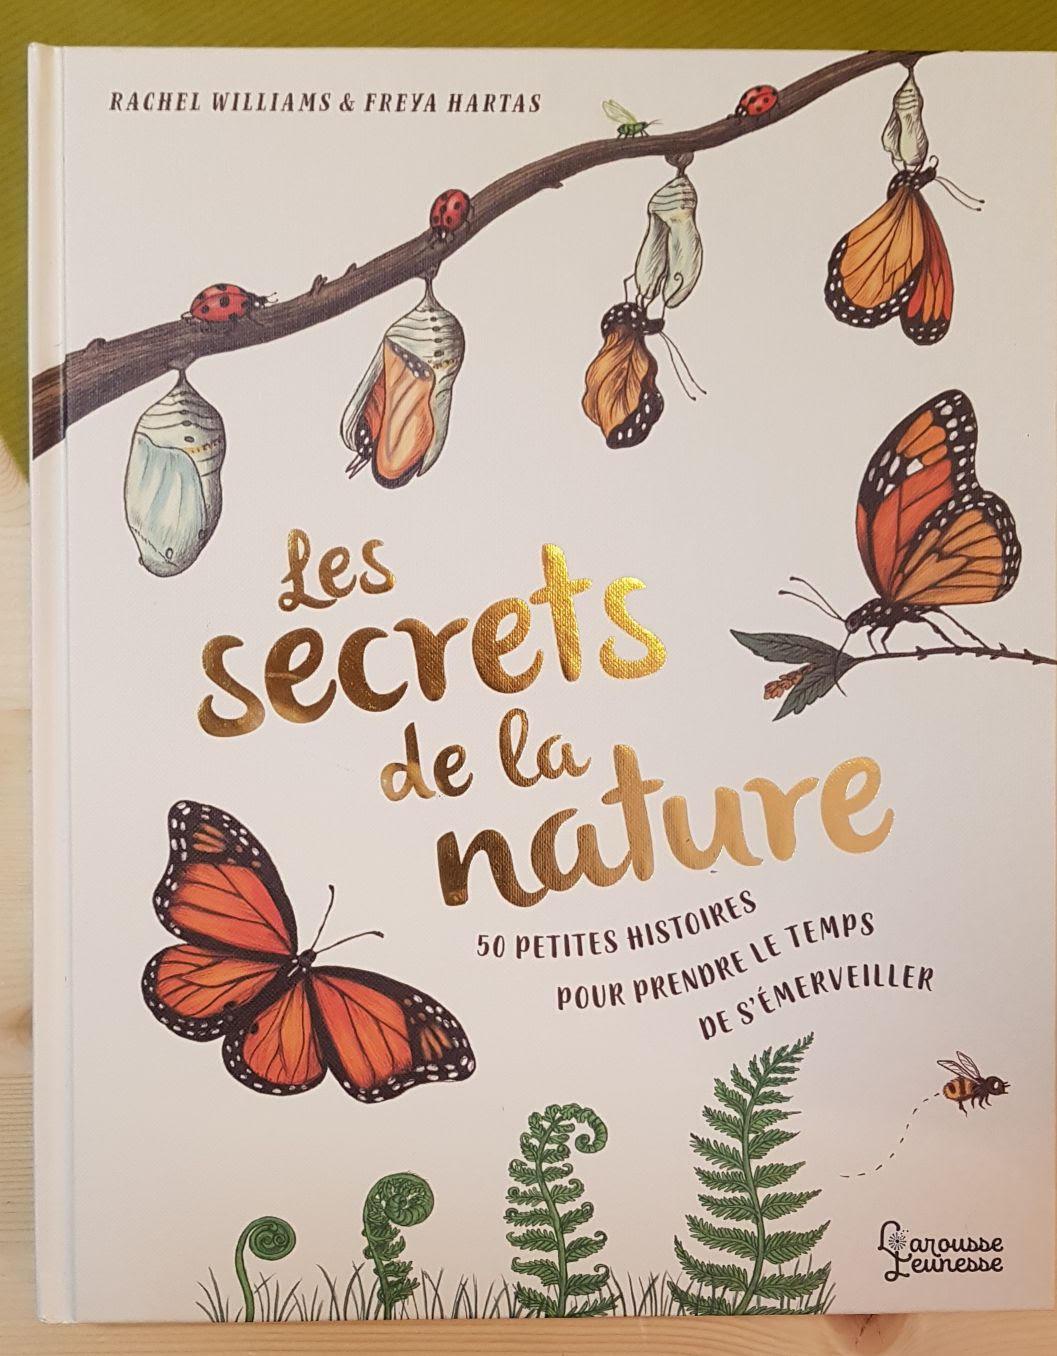 Les secrets de la nature librairie la librai'bulles